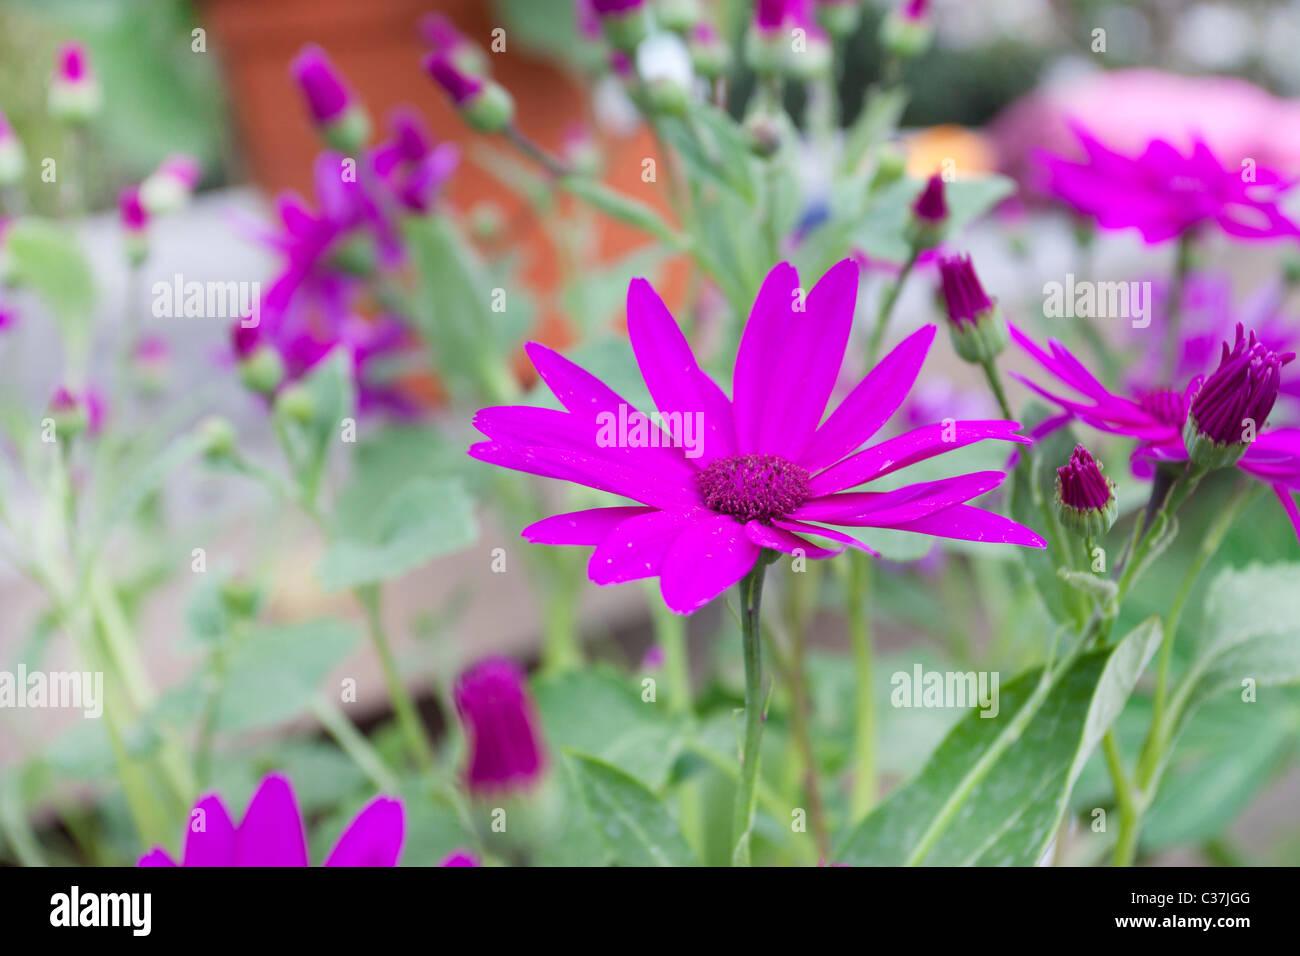 Perennial Spring Flowering Pink Flowers Called Senetti Stock Photo